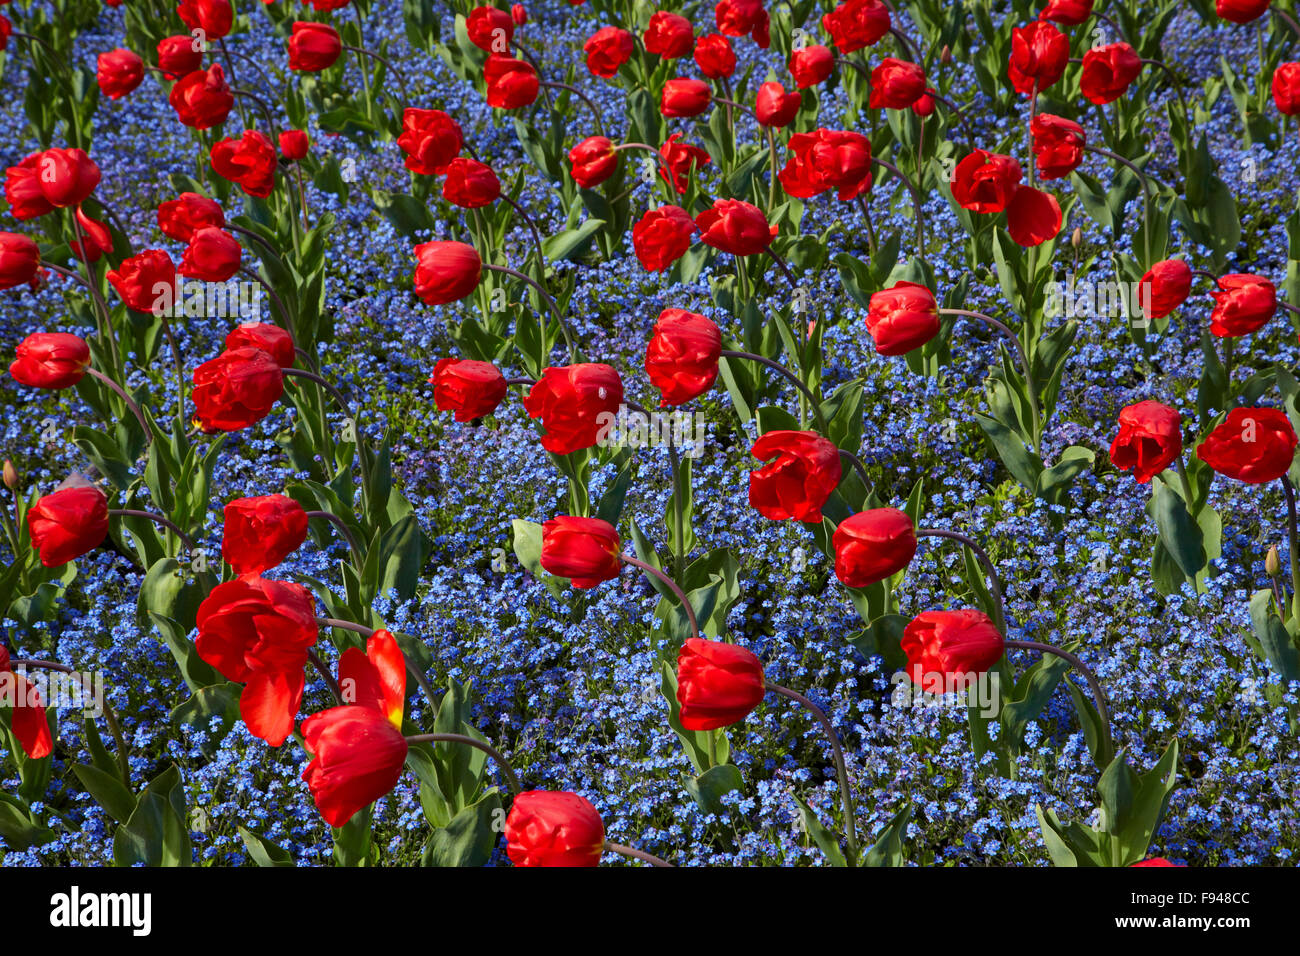 Tulips, Botanic Gardens, Hagley Park, Christchurch, Canterbury, South Island, New Zealand - Stock Image